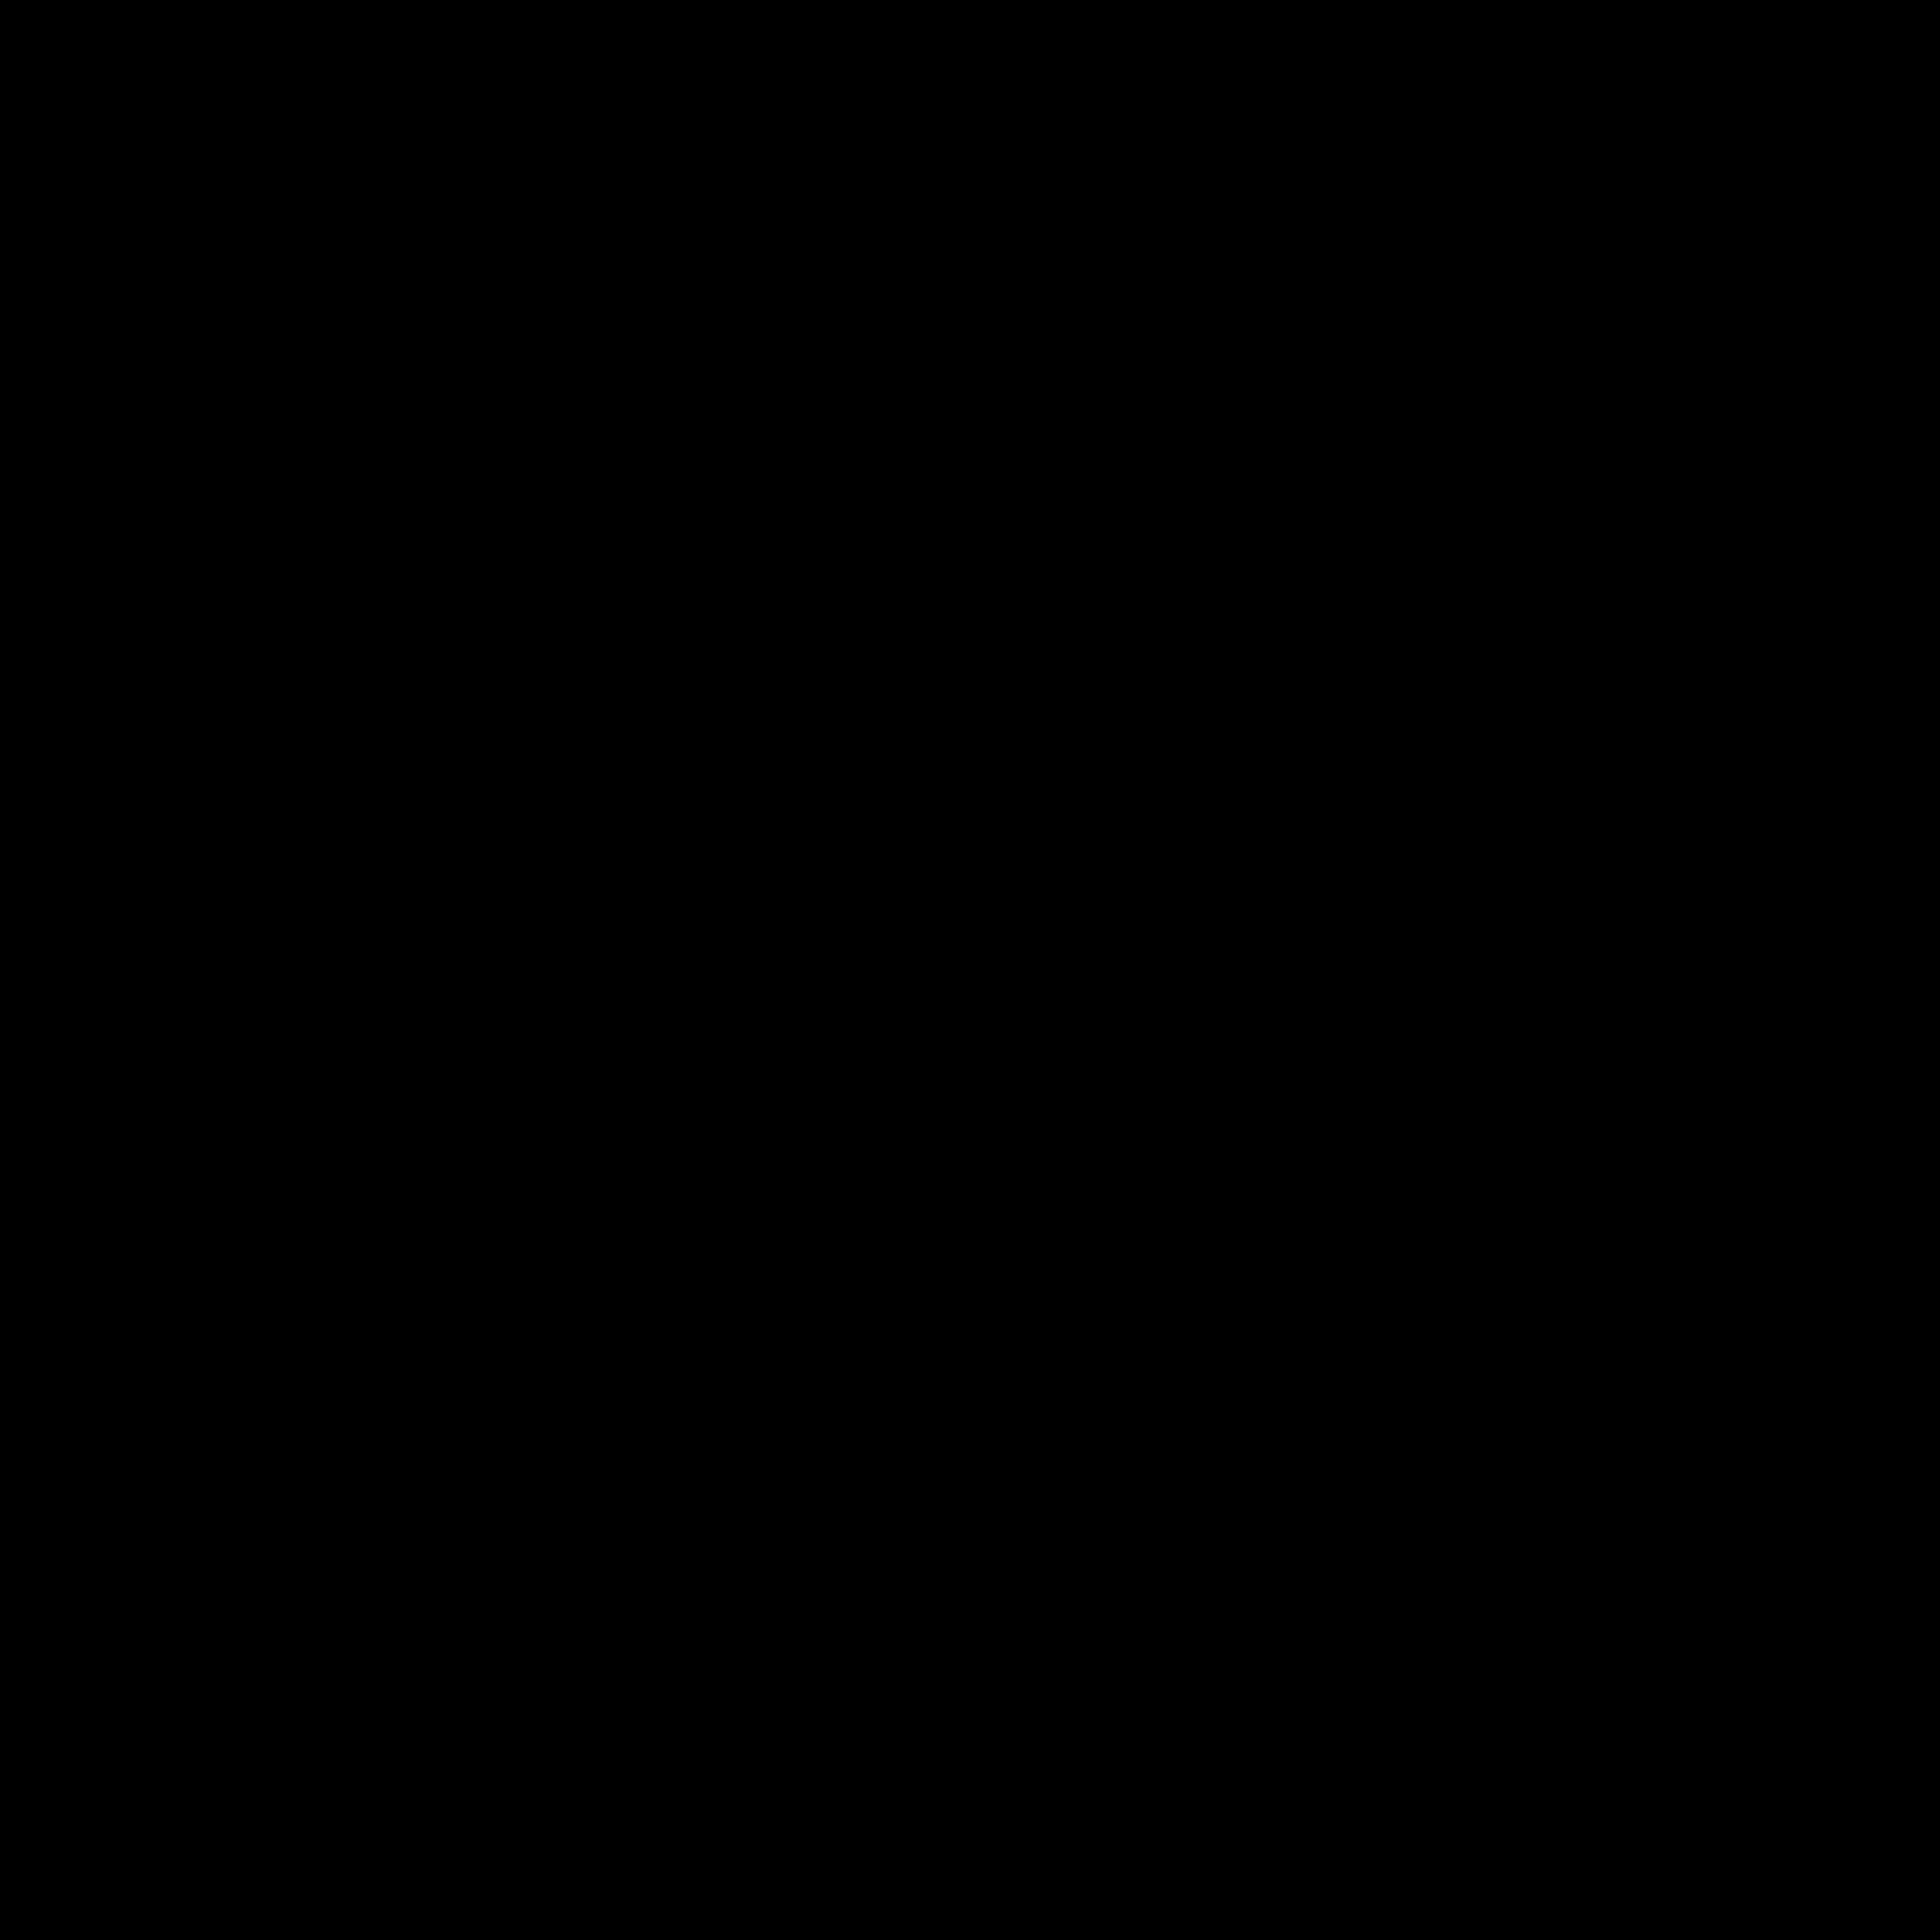 Moldex Vector Png Svg - Logo Supply Freebie Transparent amp;